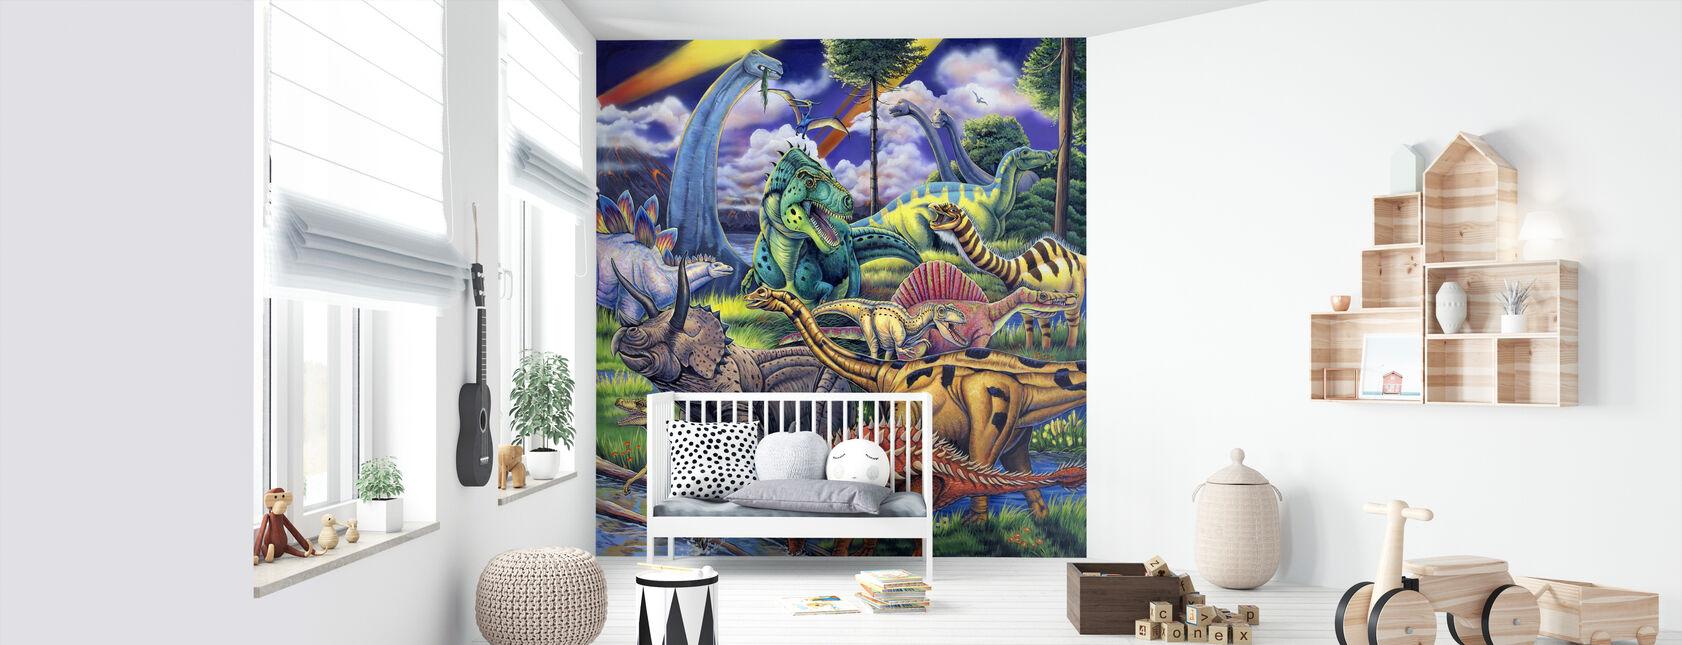 Dinosaur Friends - Wallpaper - Nursery